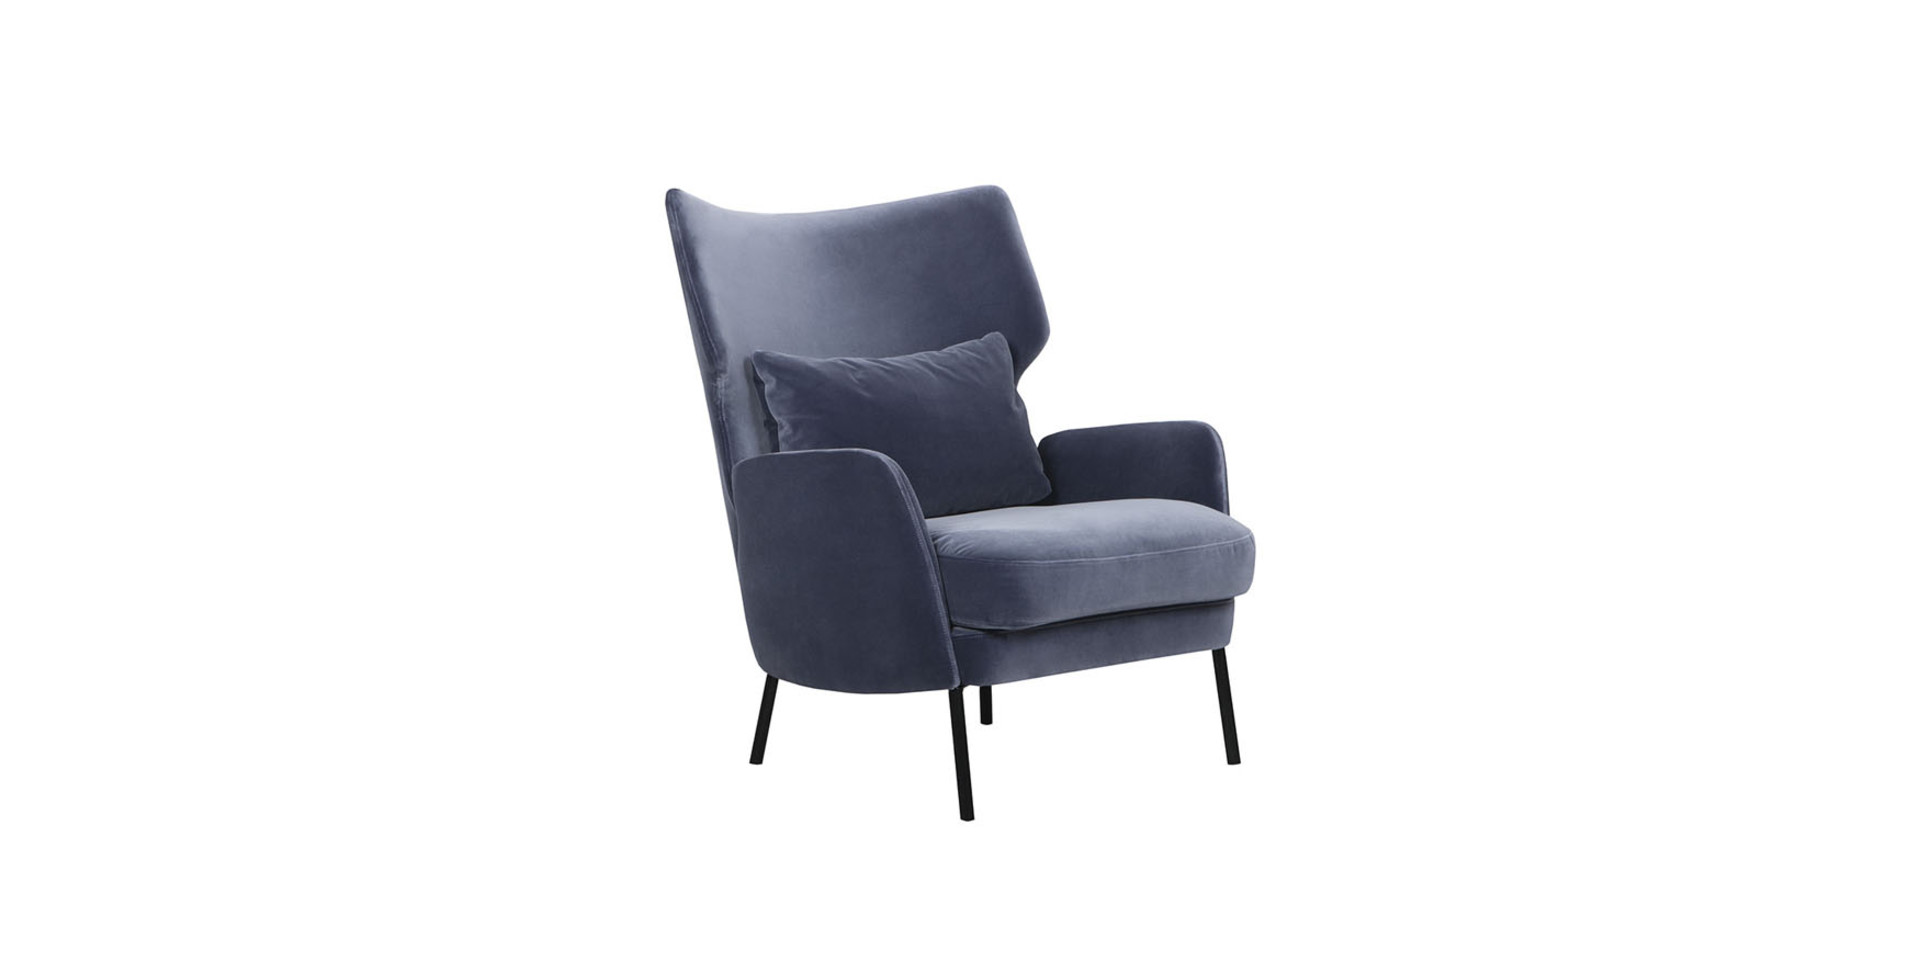 sits-alex-fauteuil-armchair_lario20_indigo_2